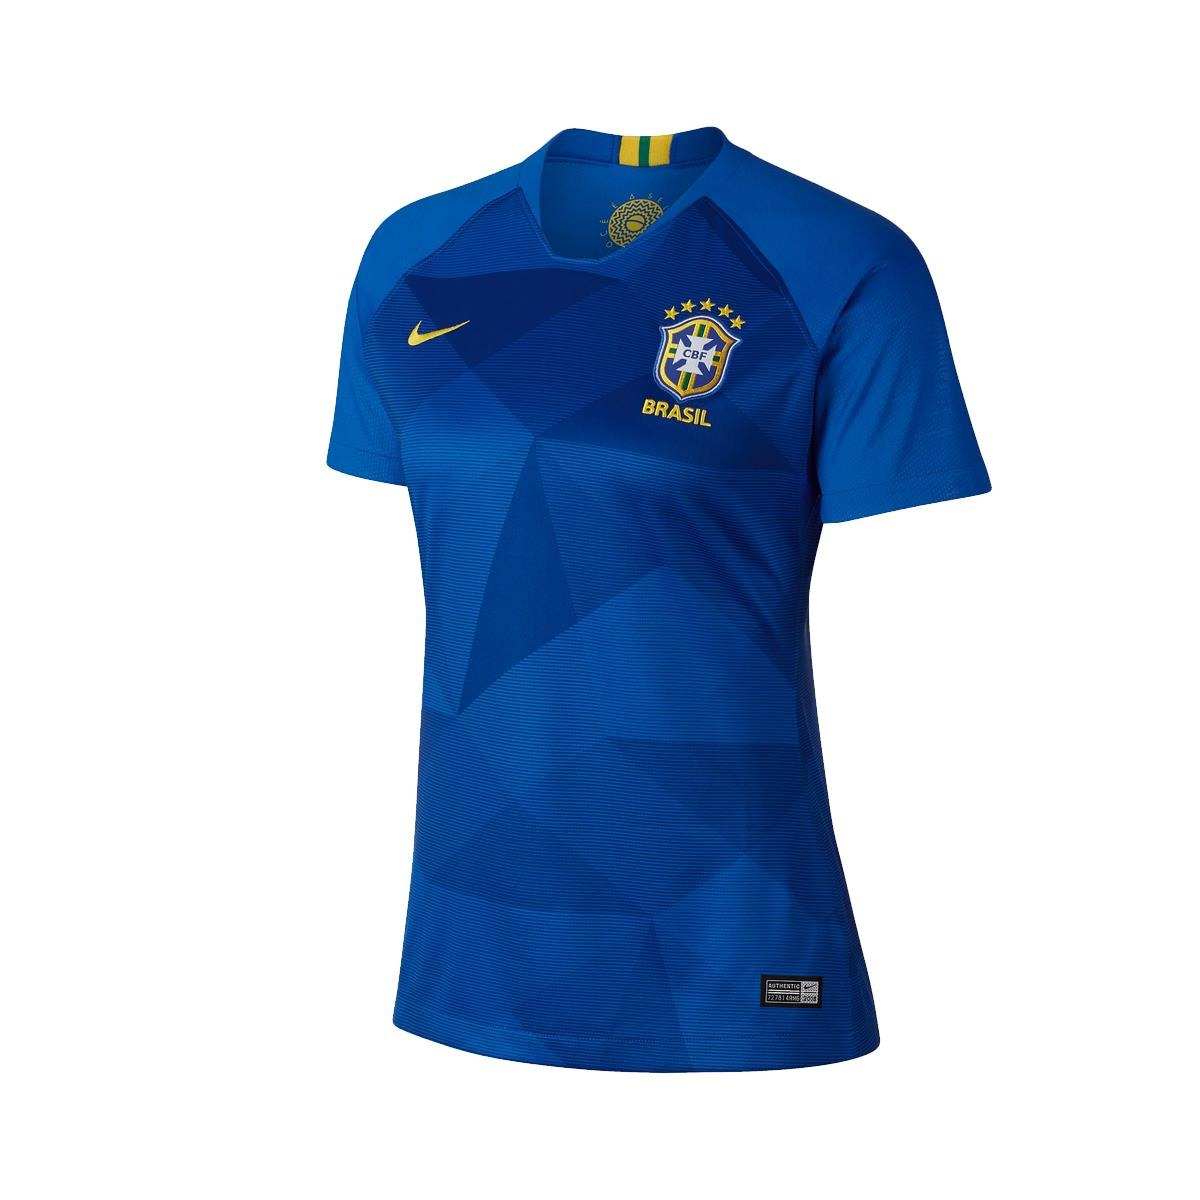 ee11523c2d Camisa Nike Brasil Ii 2018 19 Torcedora Feminina M - R  269